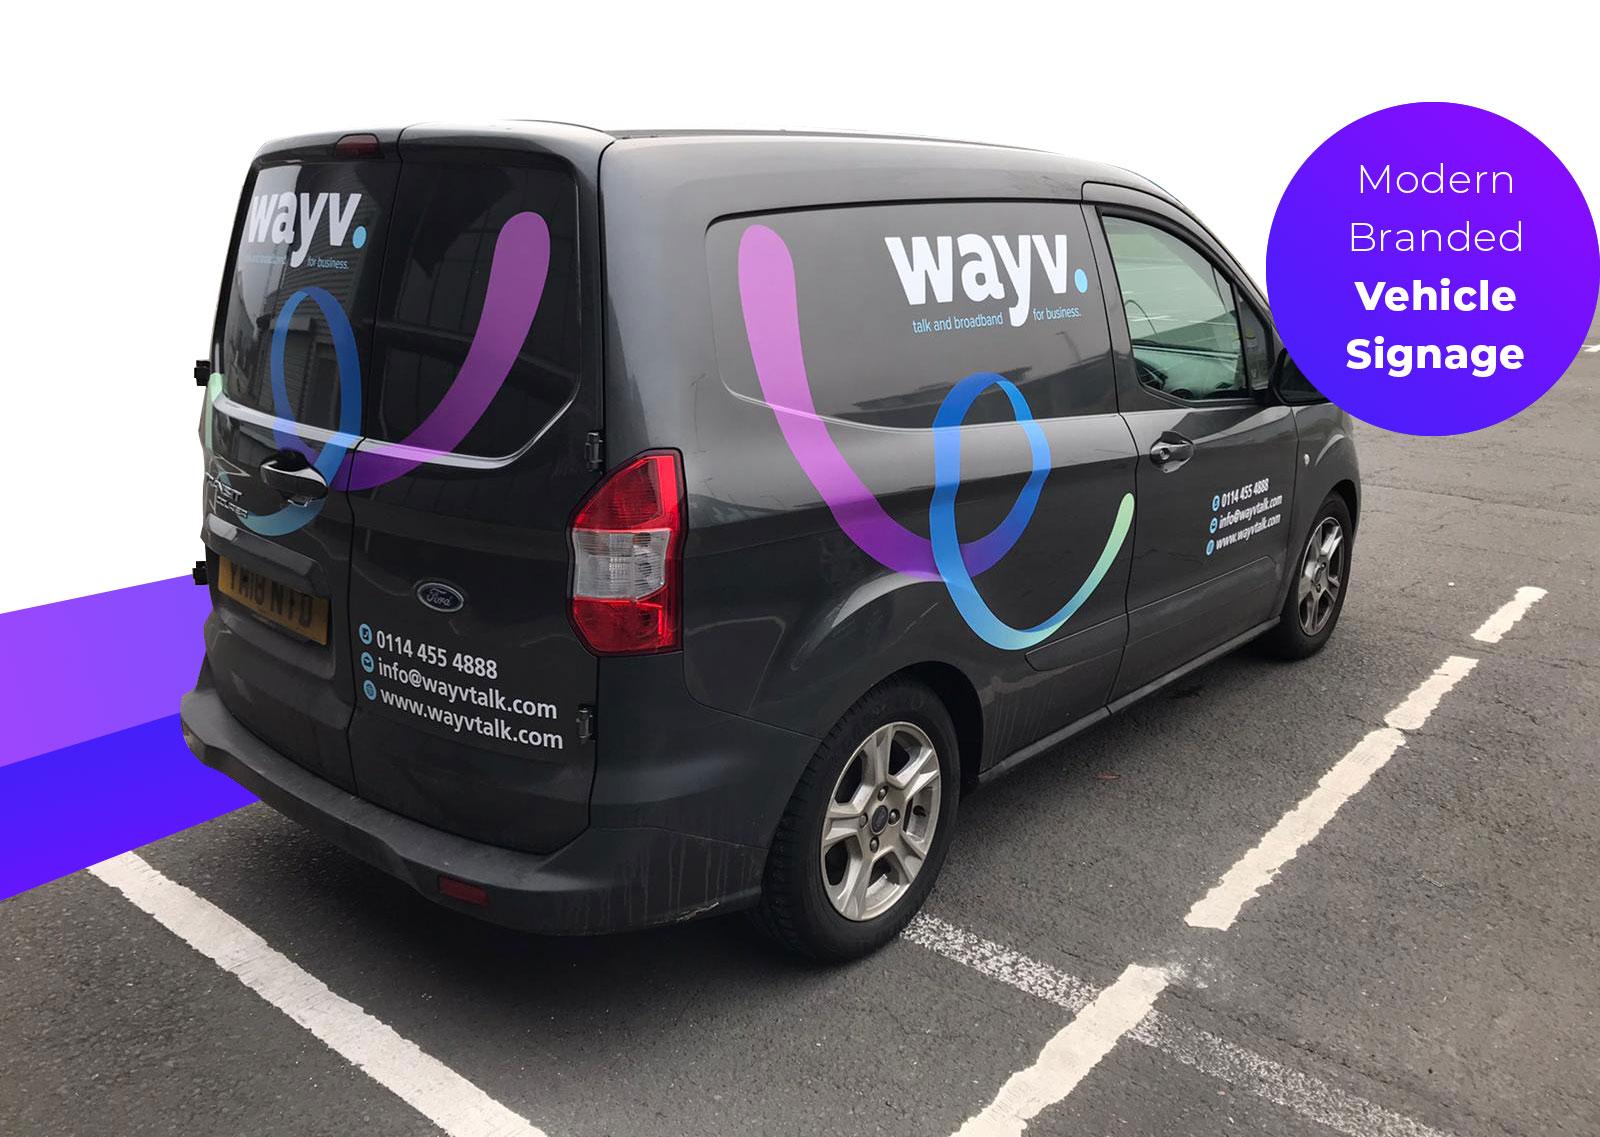 Vehicle livery Image